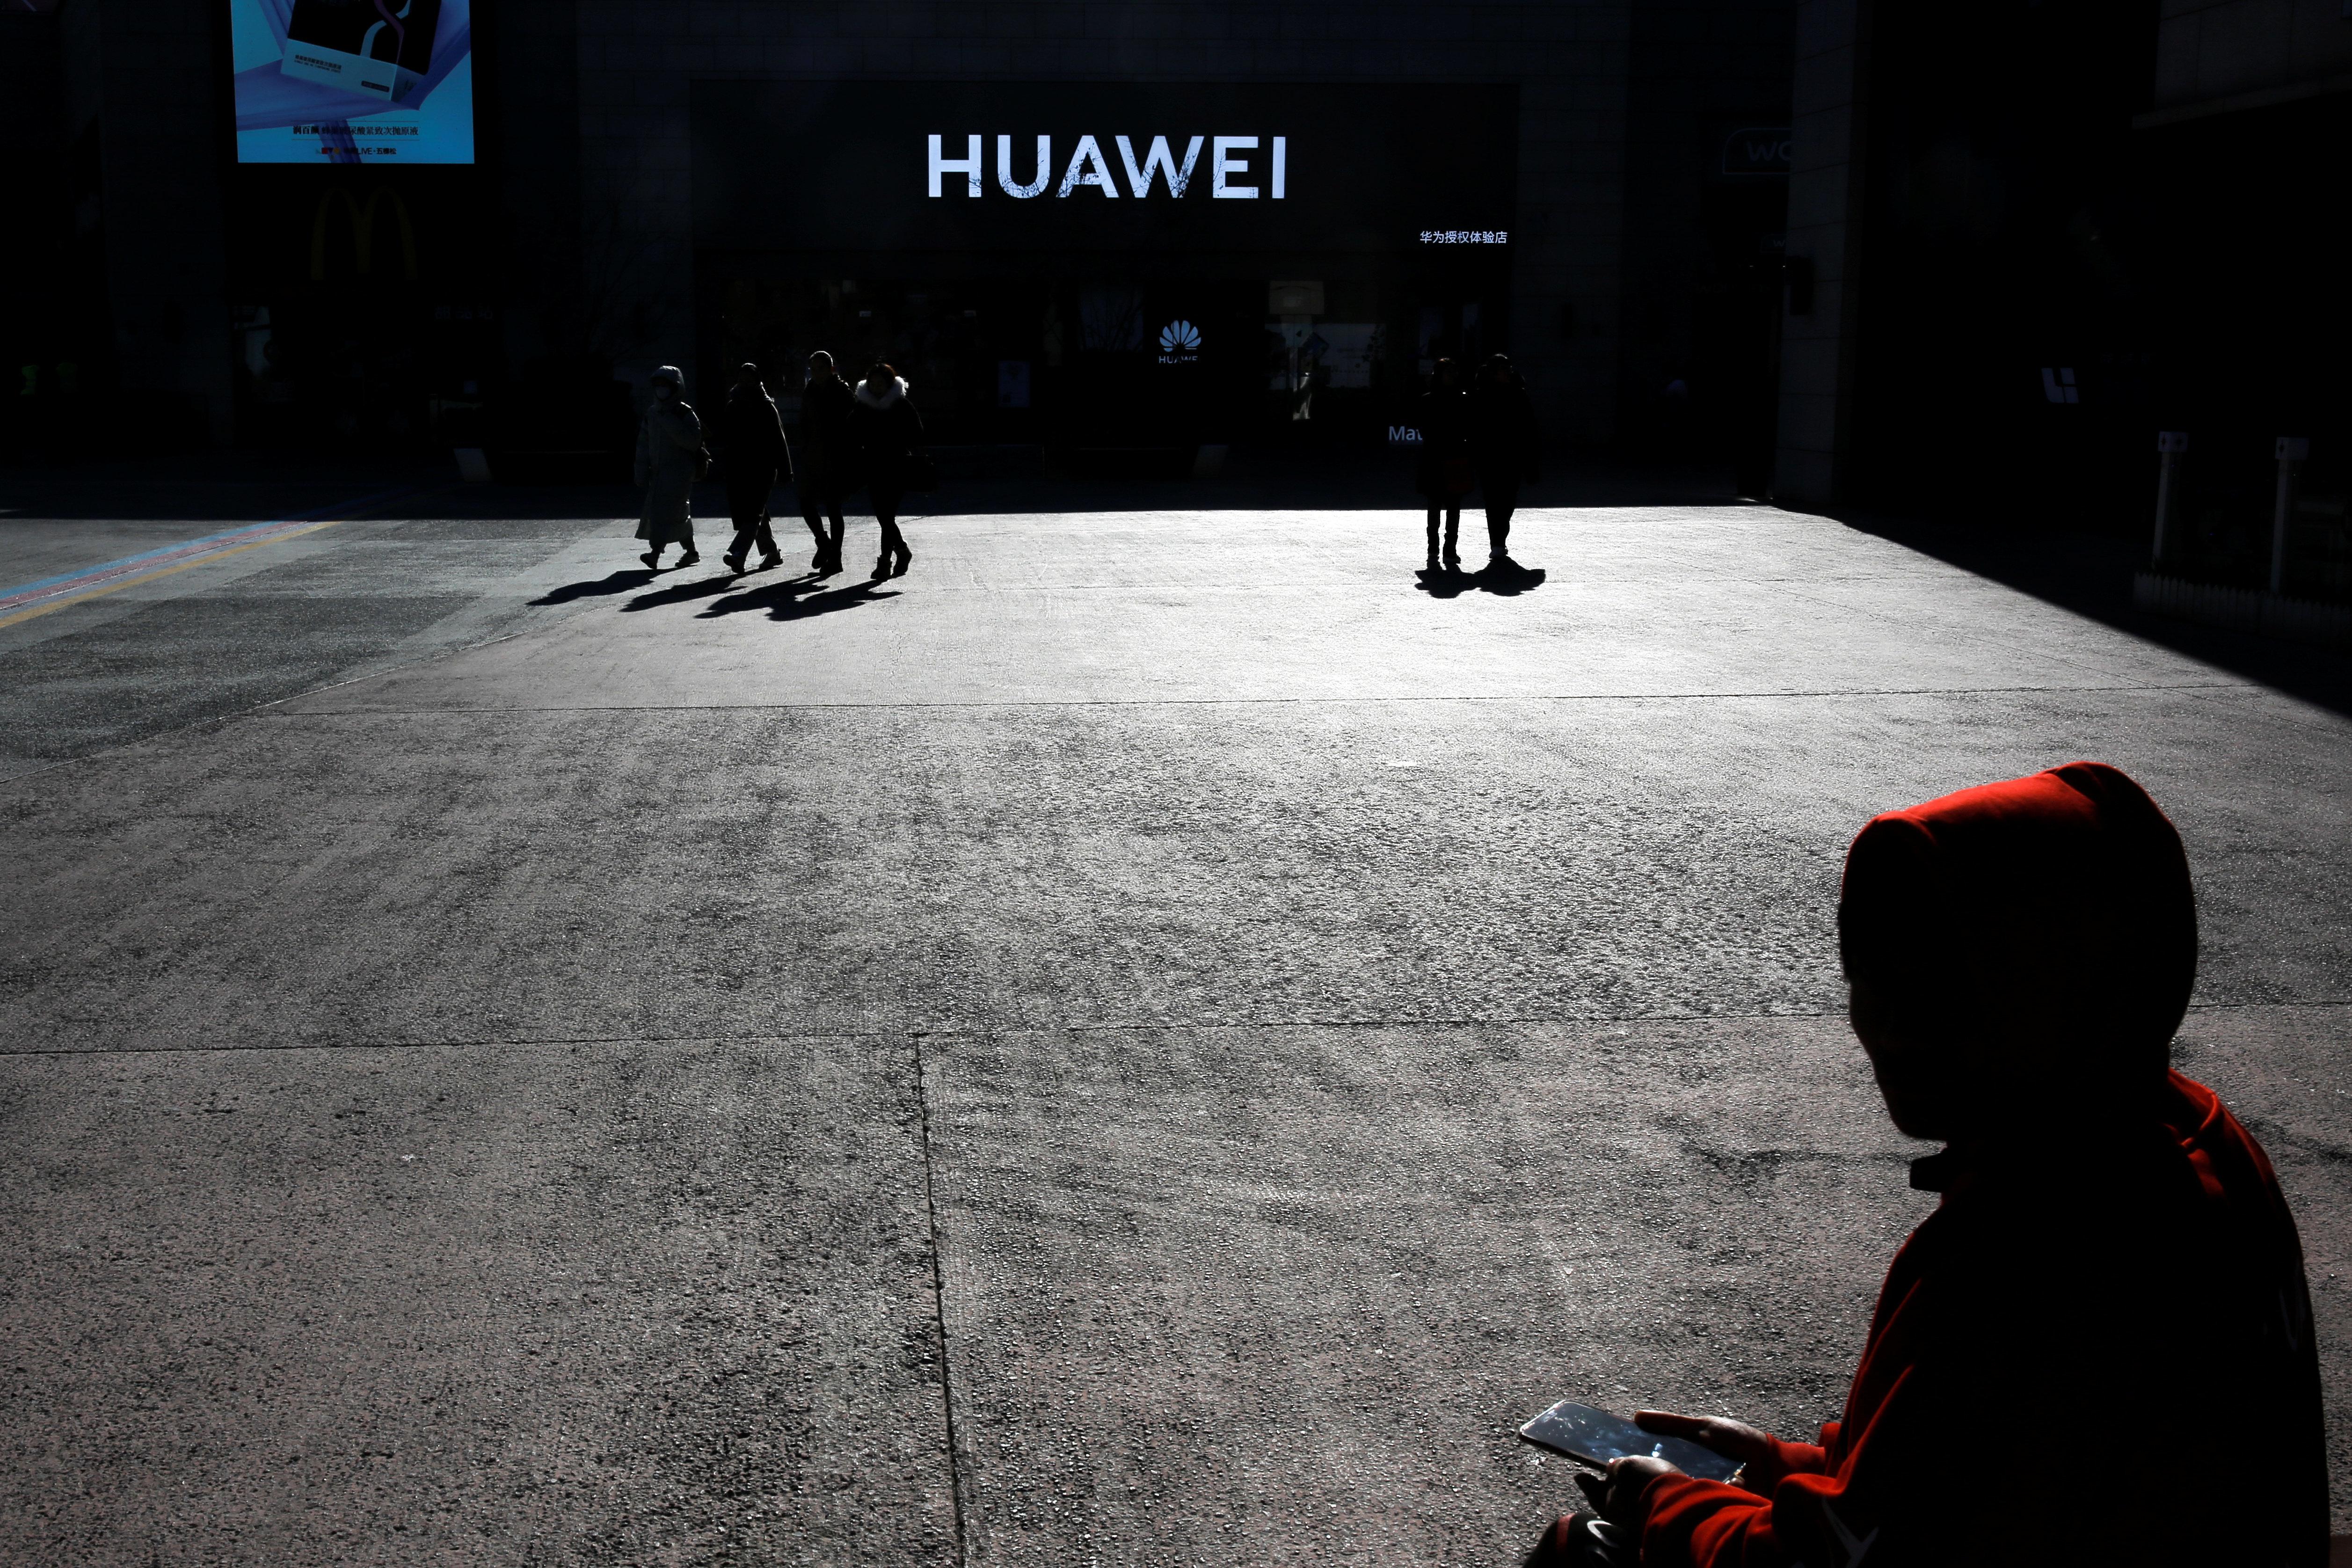 Crypto: Mία ιστορία κατασκοπείας, το κινητό σας και η μάχη ΗΠΑ - Κίνας για την